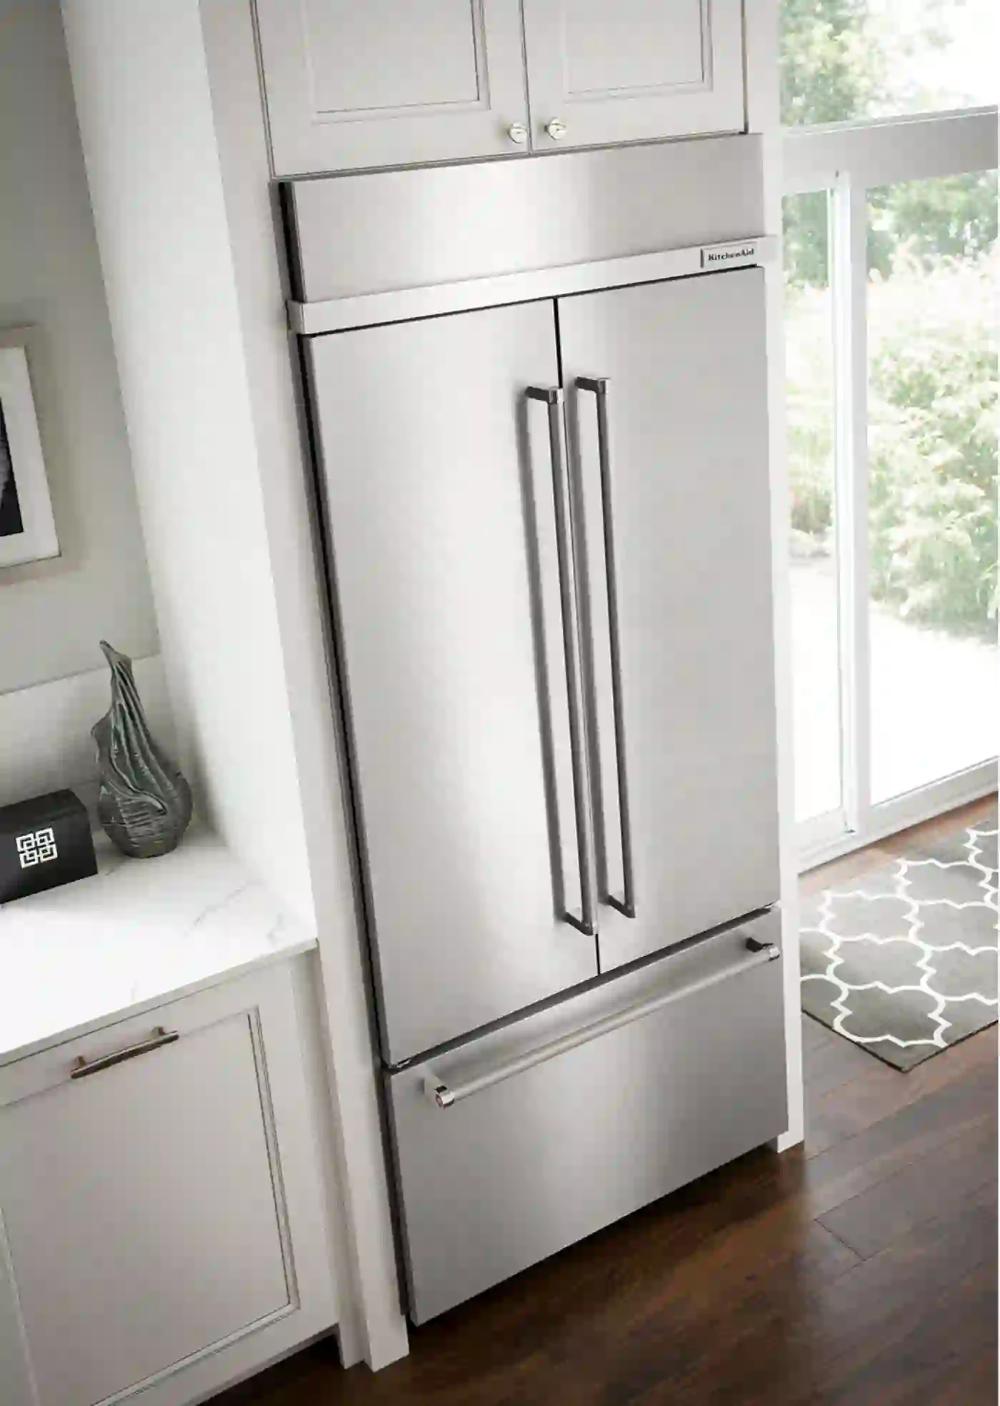 Kbfn506ess By Kitchenaid French Door Refrigerators Goedekers Com French Door Refrigerator Built In Refrigerator French Doors Interior